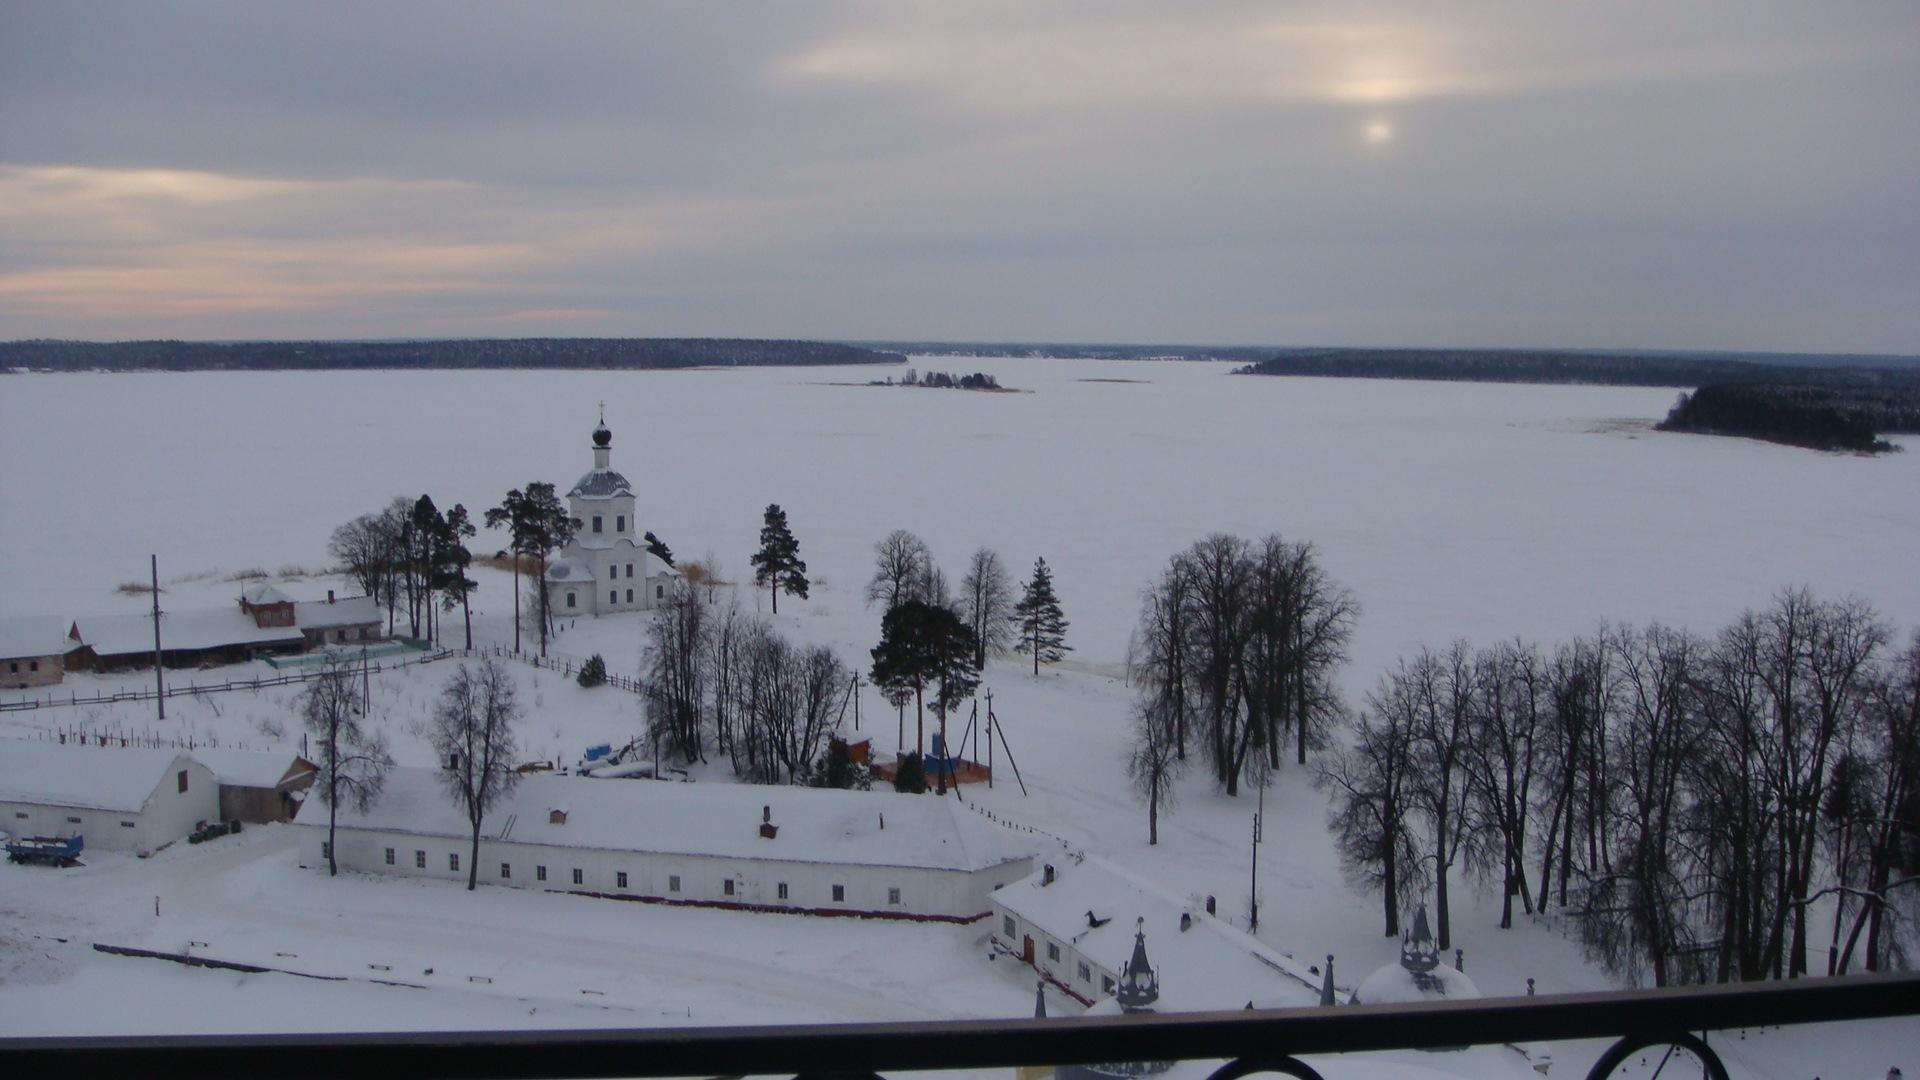 также, селигер зима фото избами